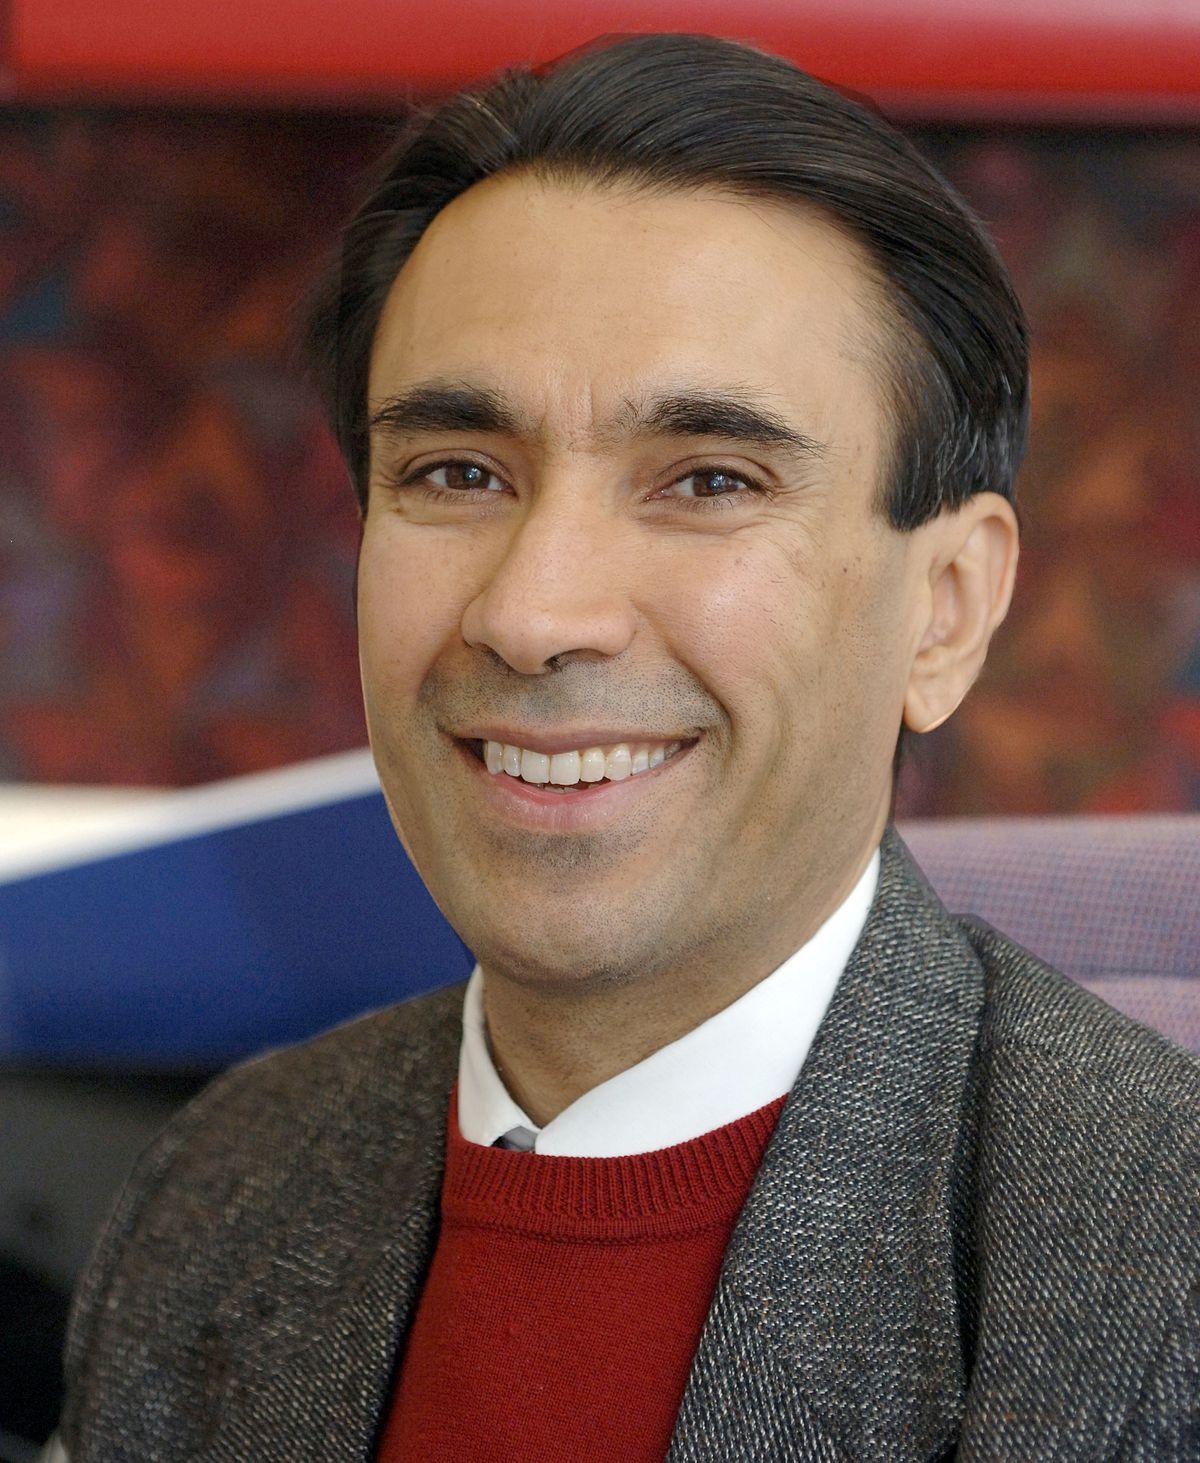 Sanjeev Arora Physician Wikipedia